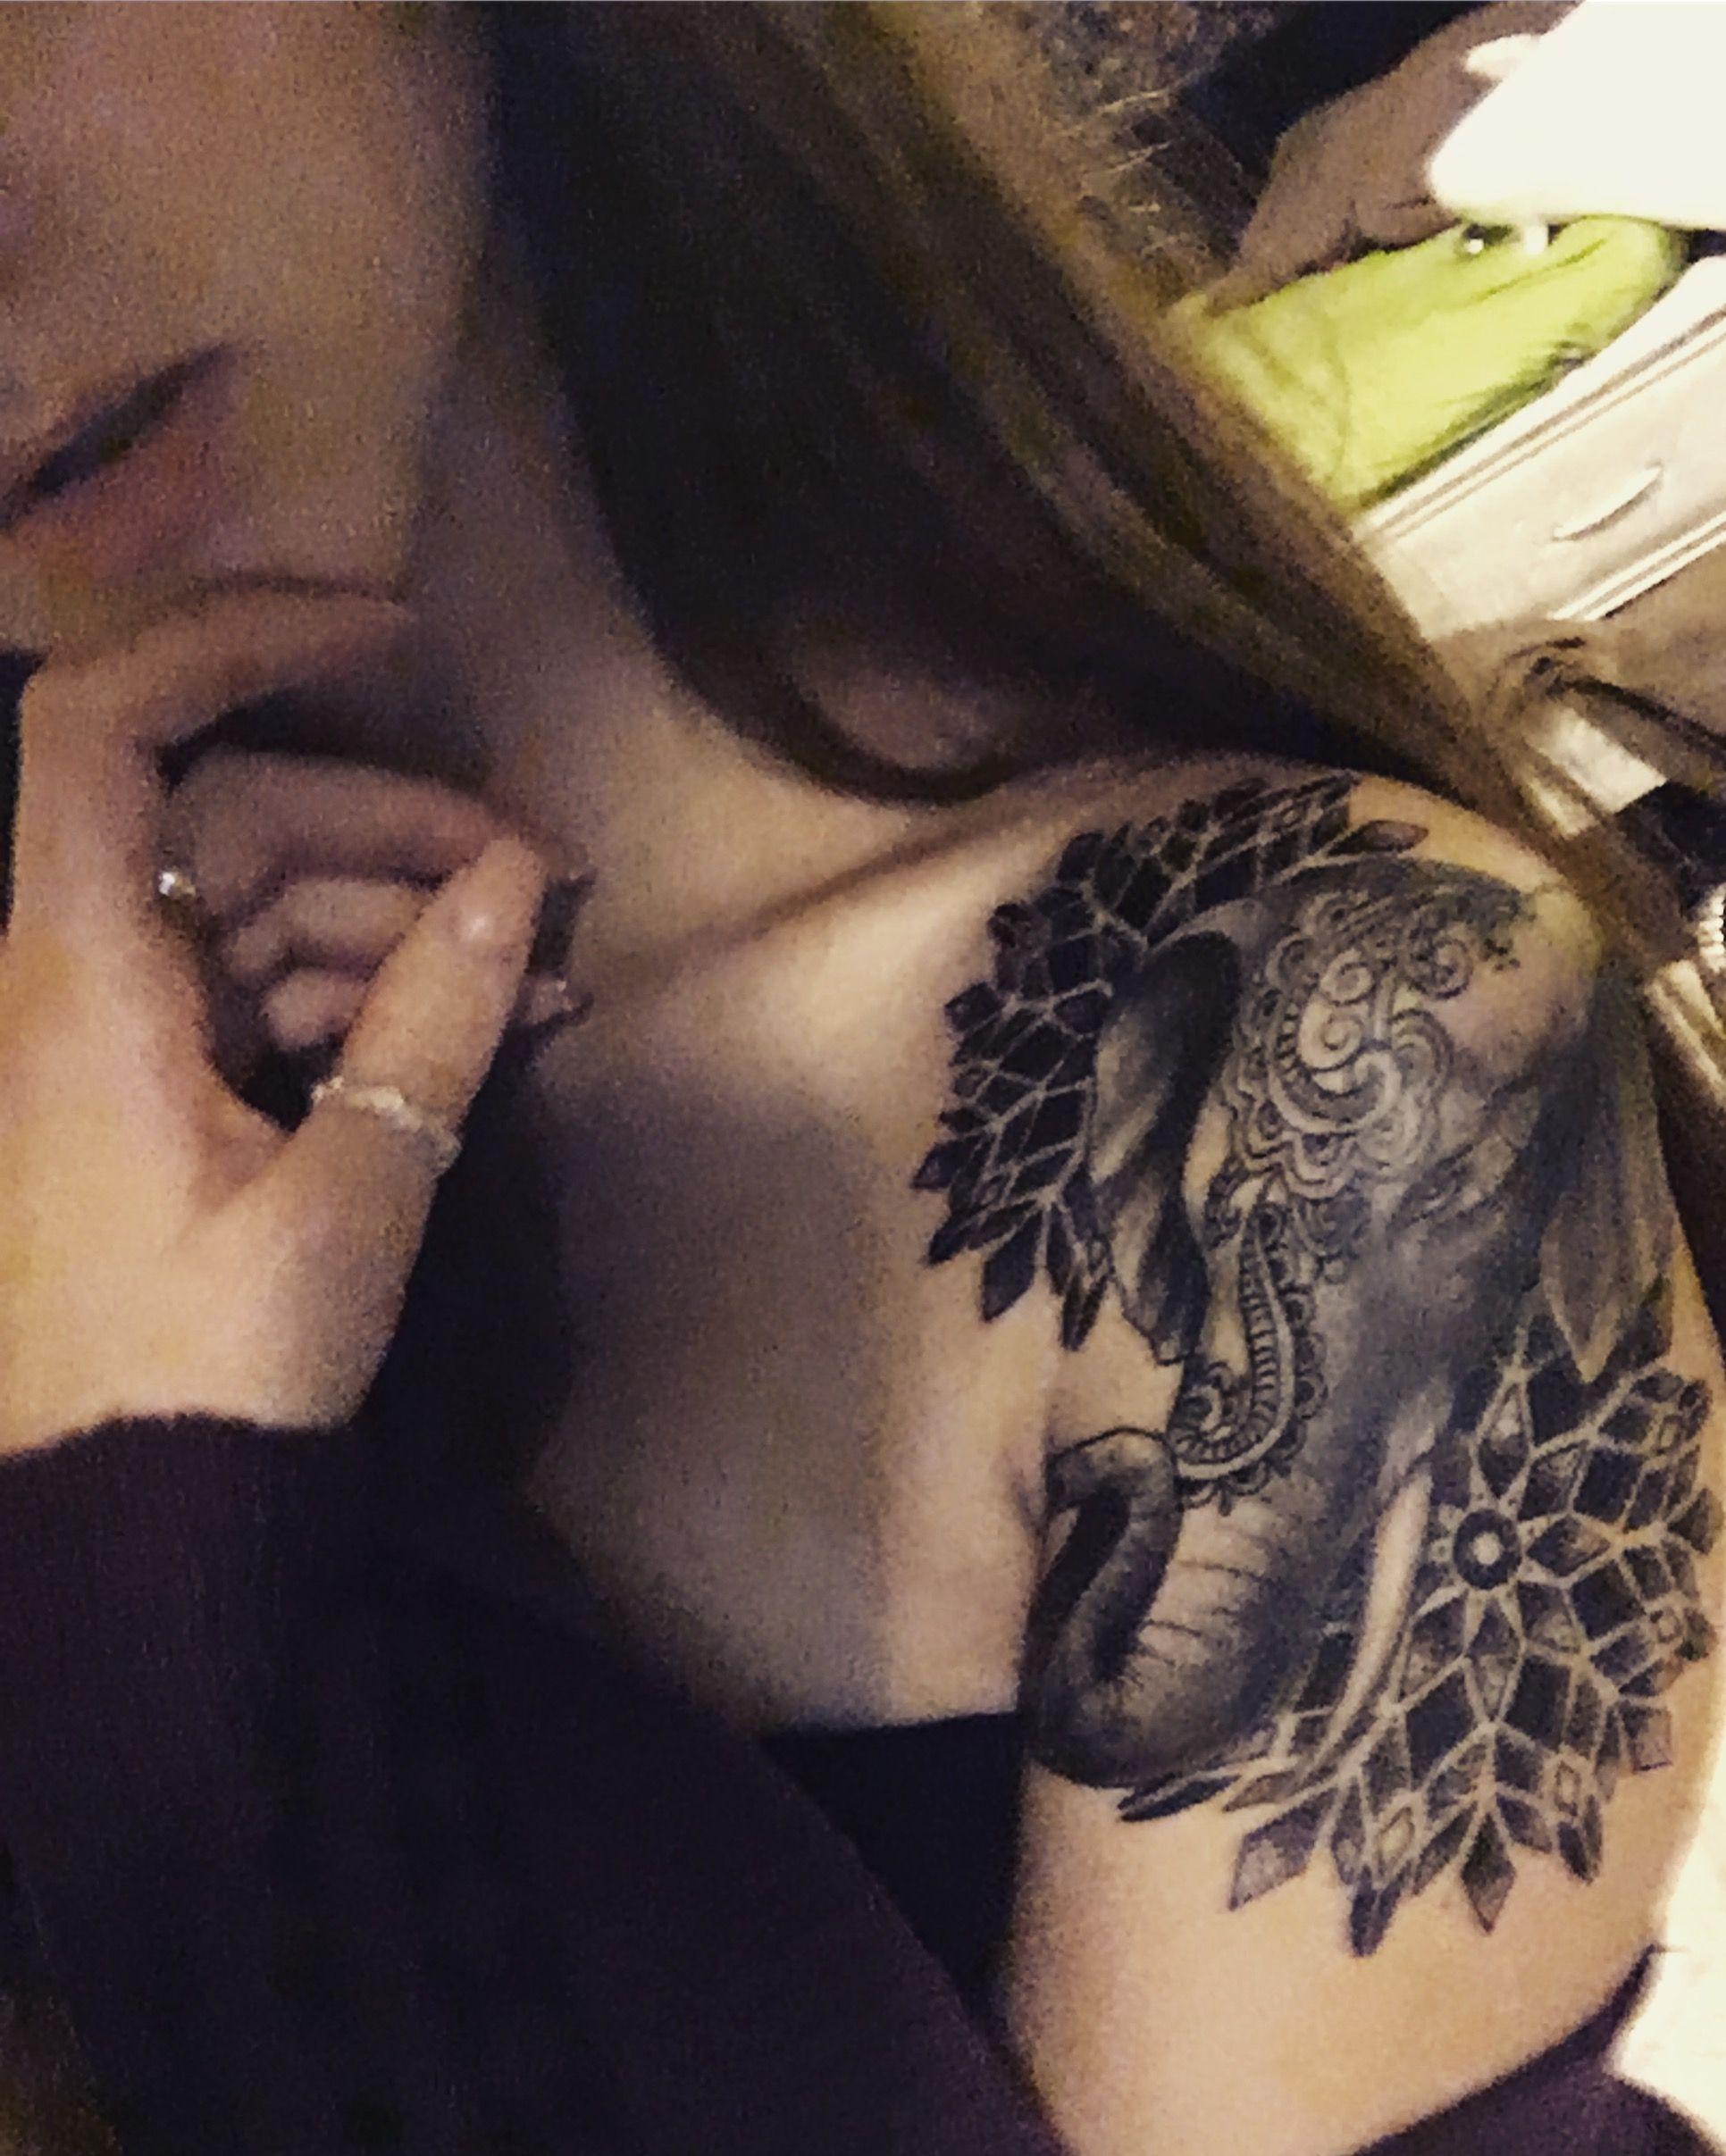 53 Top Mandala Tattoos Of All Time: Mandala And Elephant Tattoo